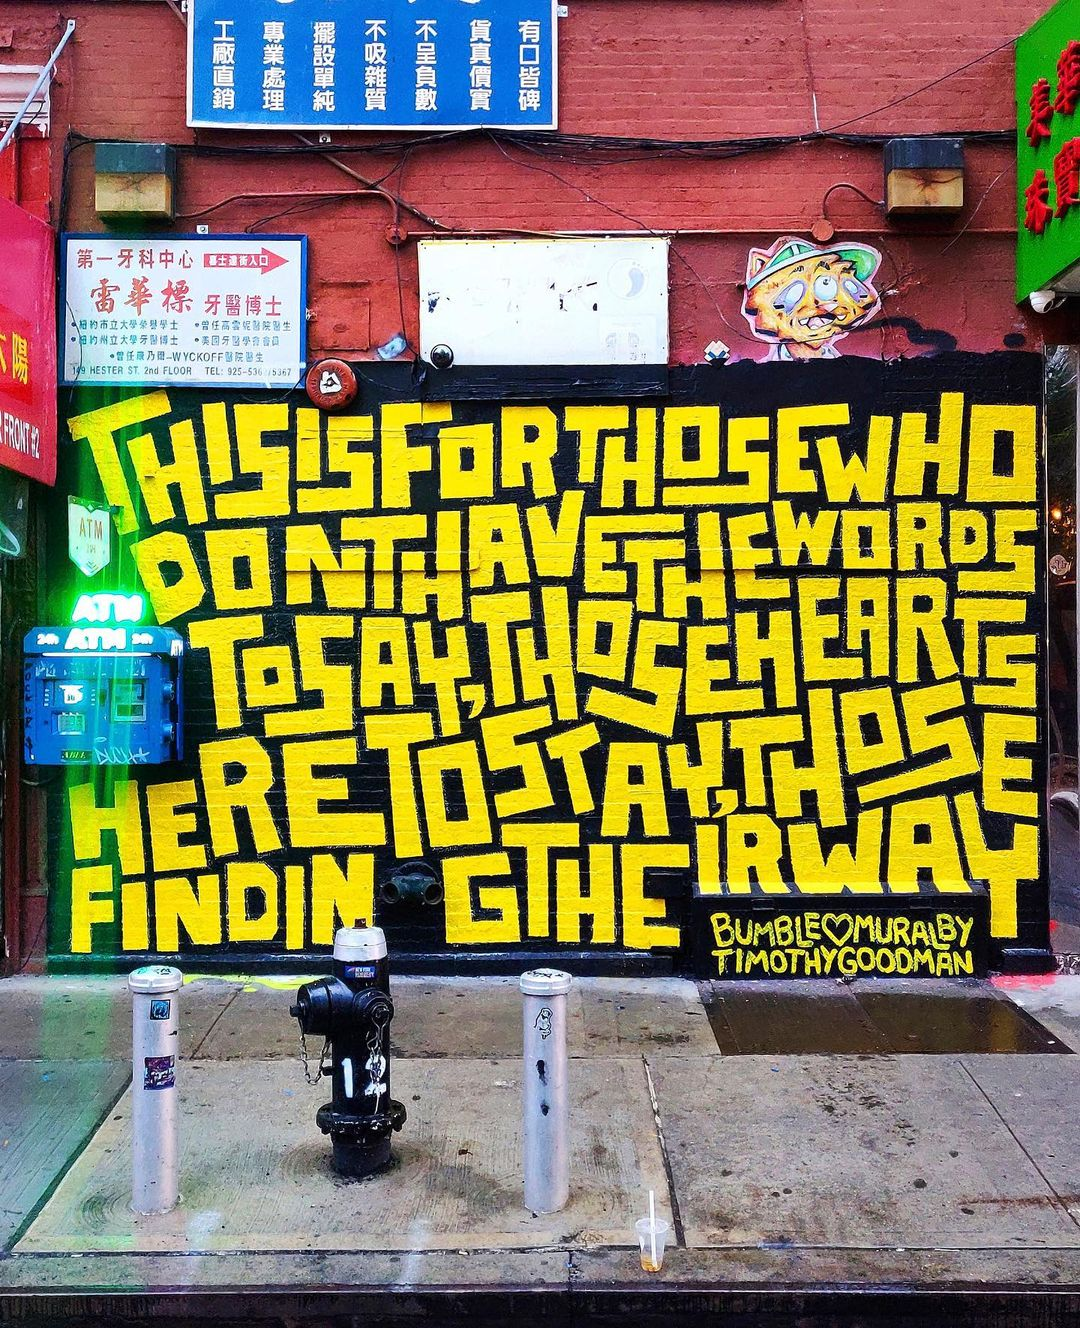 Artwork By Timothy Goodman in New York City